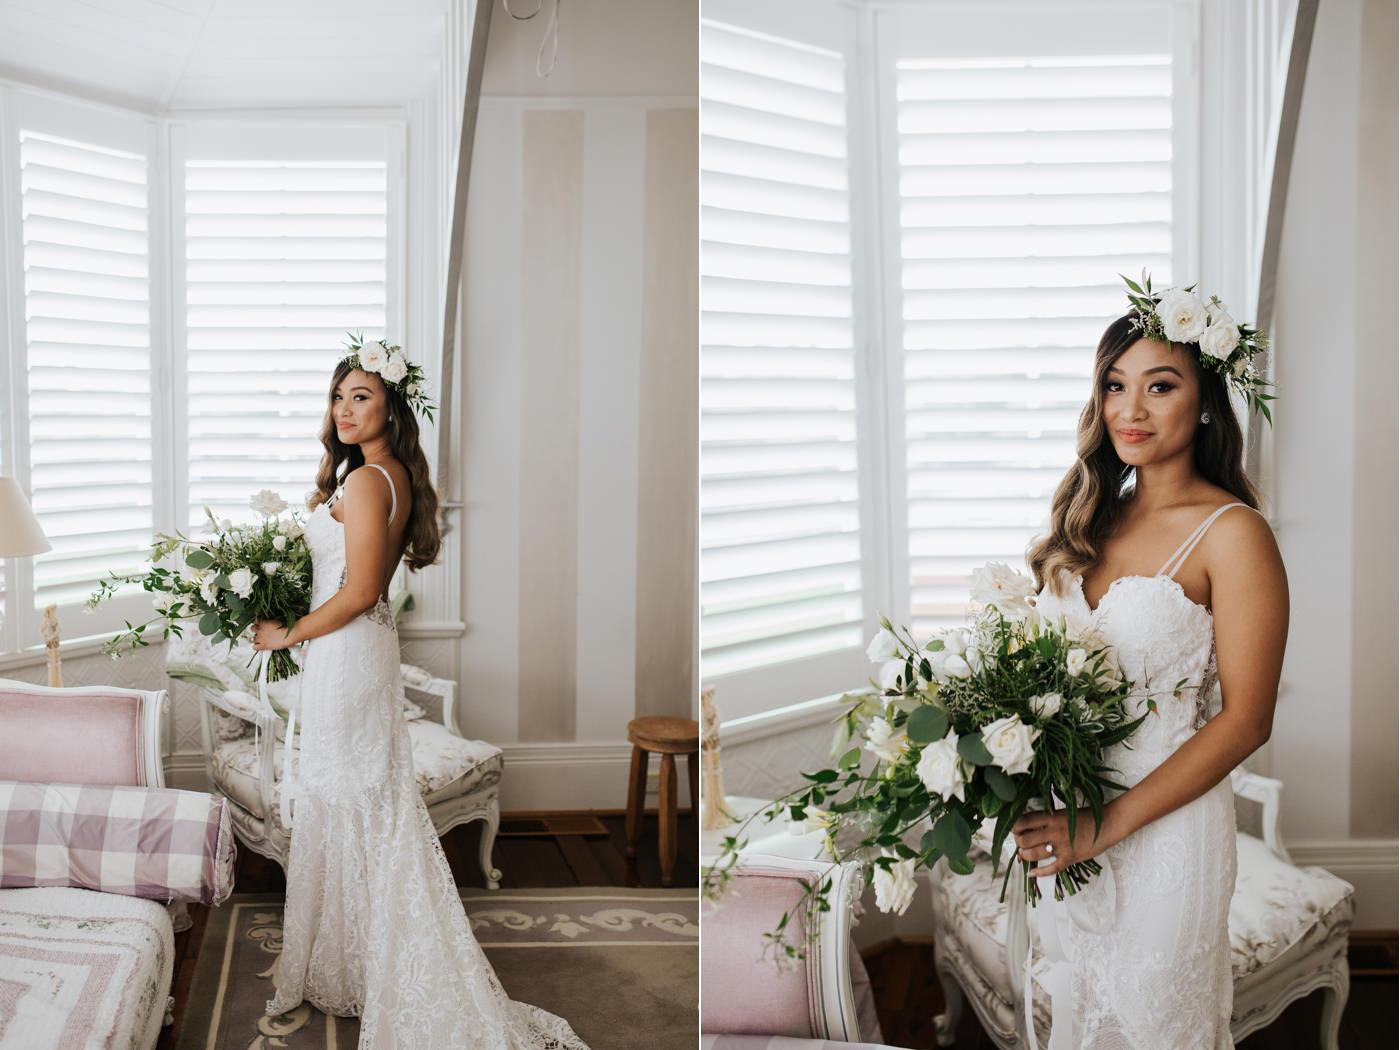 Nick & Vanezza - Fernbank Farm Wedding - Samantha Heather Photography-35.jpg